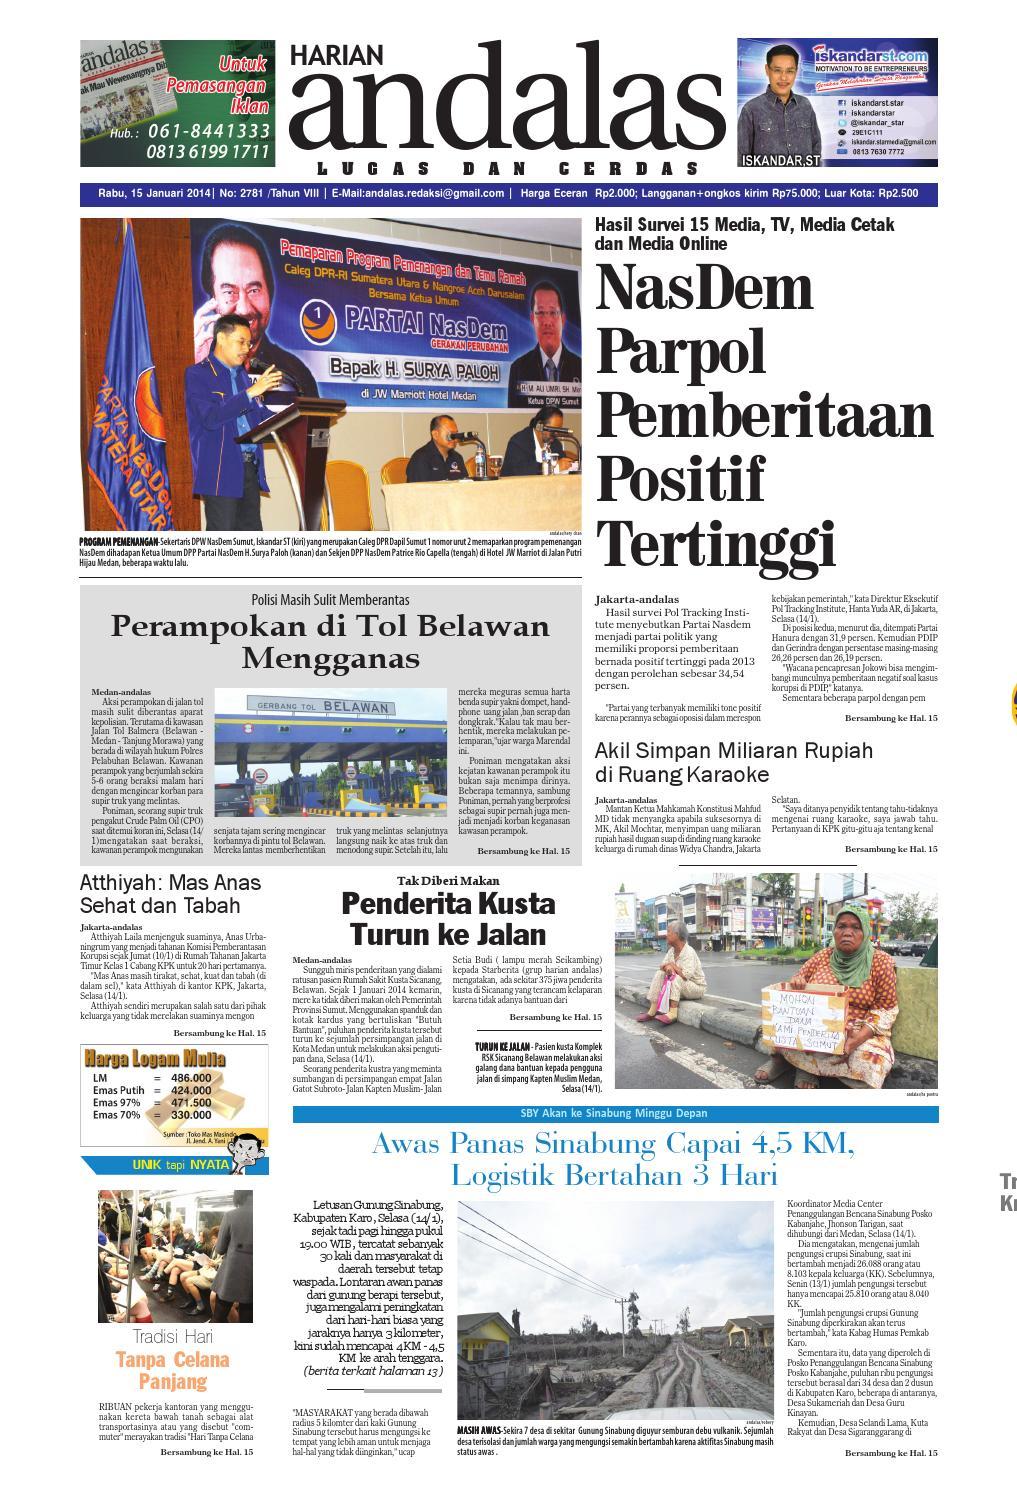 Epaper Andalas Edisi Rabu 15 Januari 2014 By Media Issuu Fcenter Lemari Pakaian Wd Hk 1802 Sh Jawa Tengah